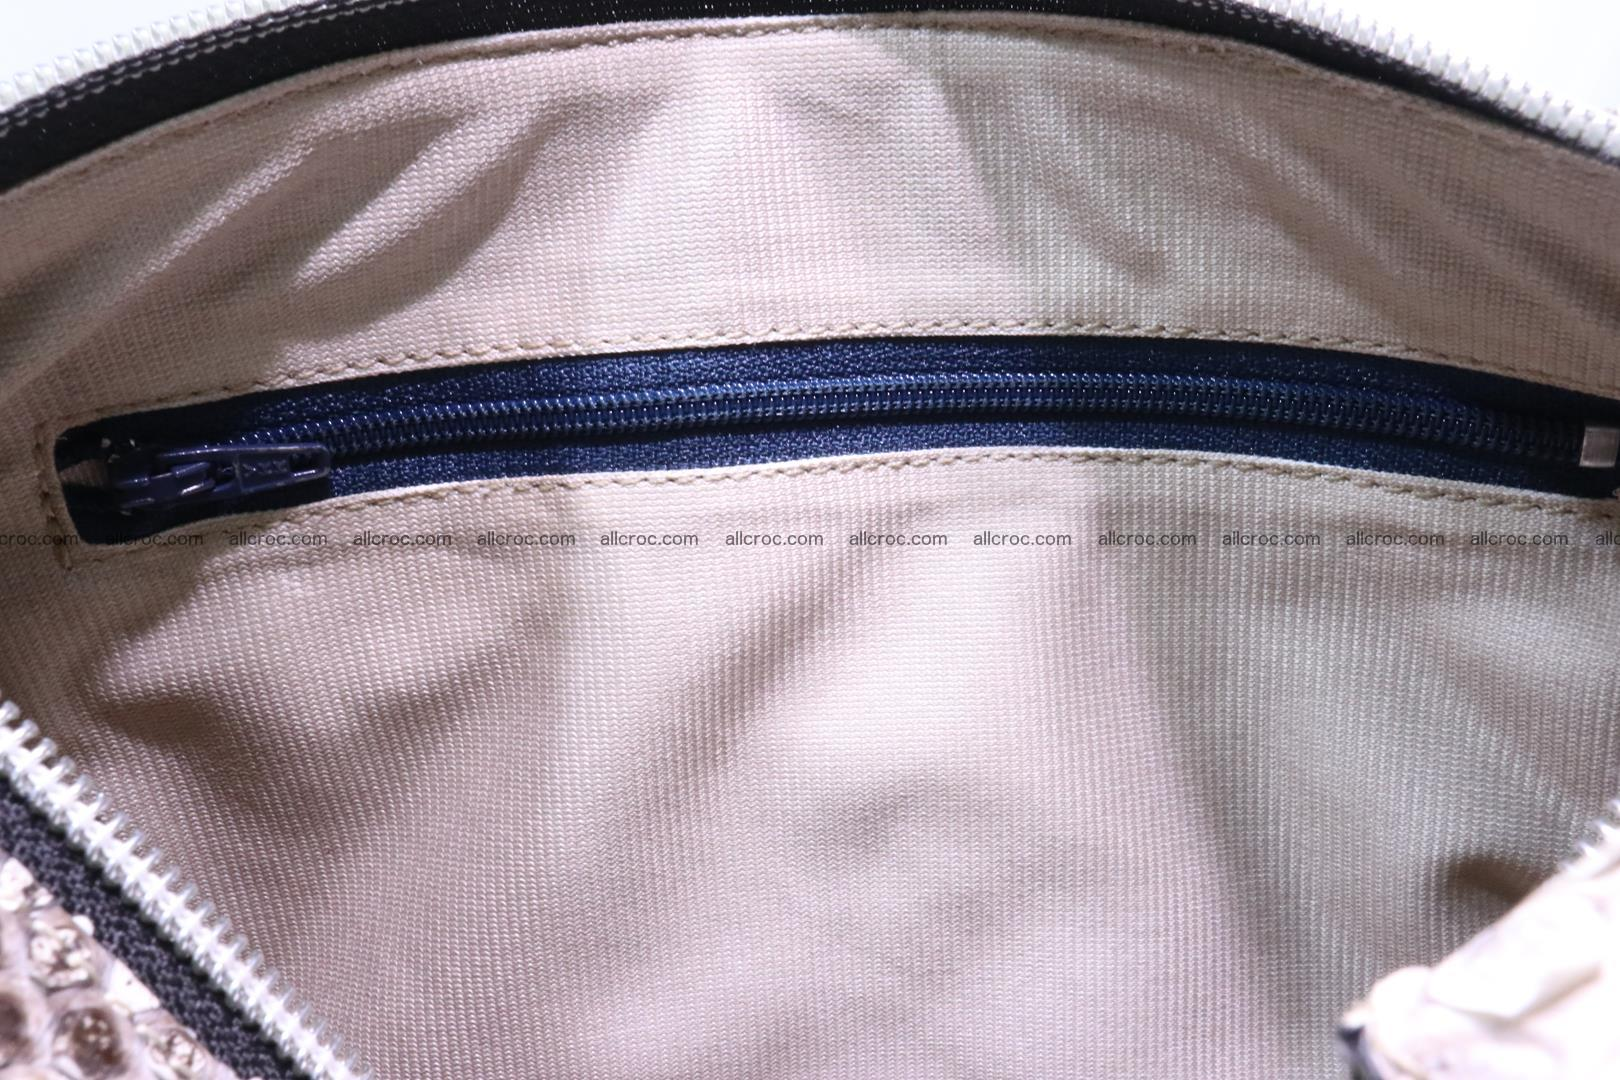 Ladies handbag, valise from genuine python skin MINI 210 Foto 12